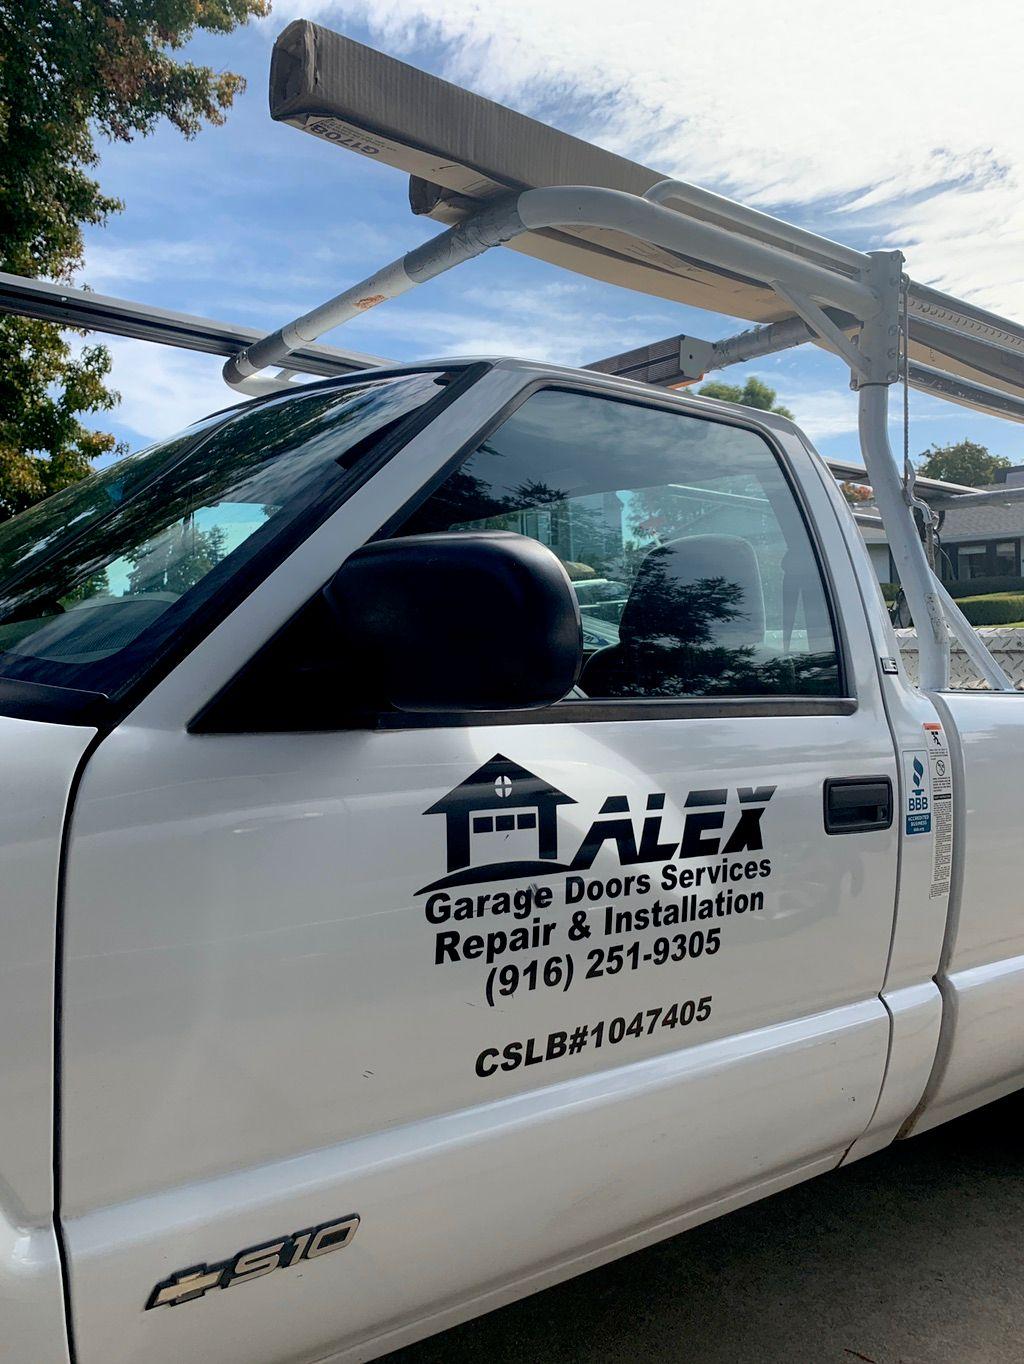 Alex garage doors services